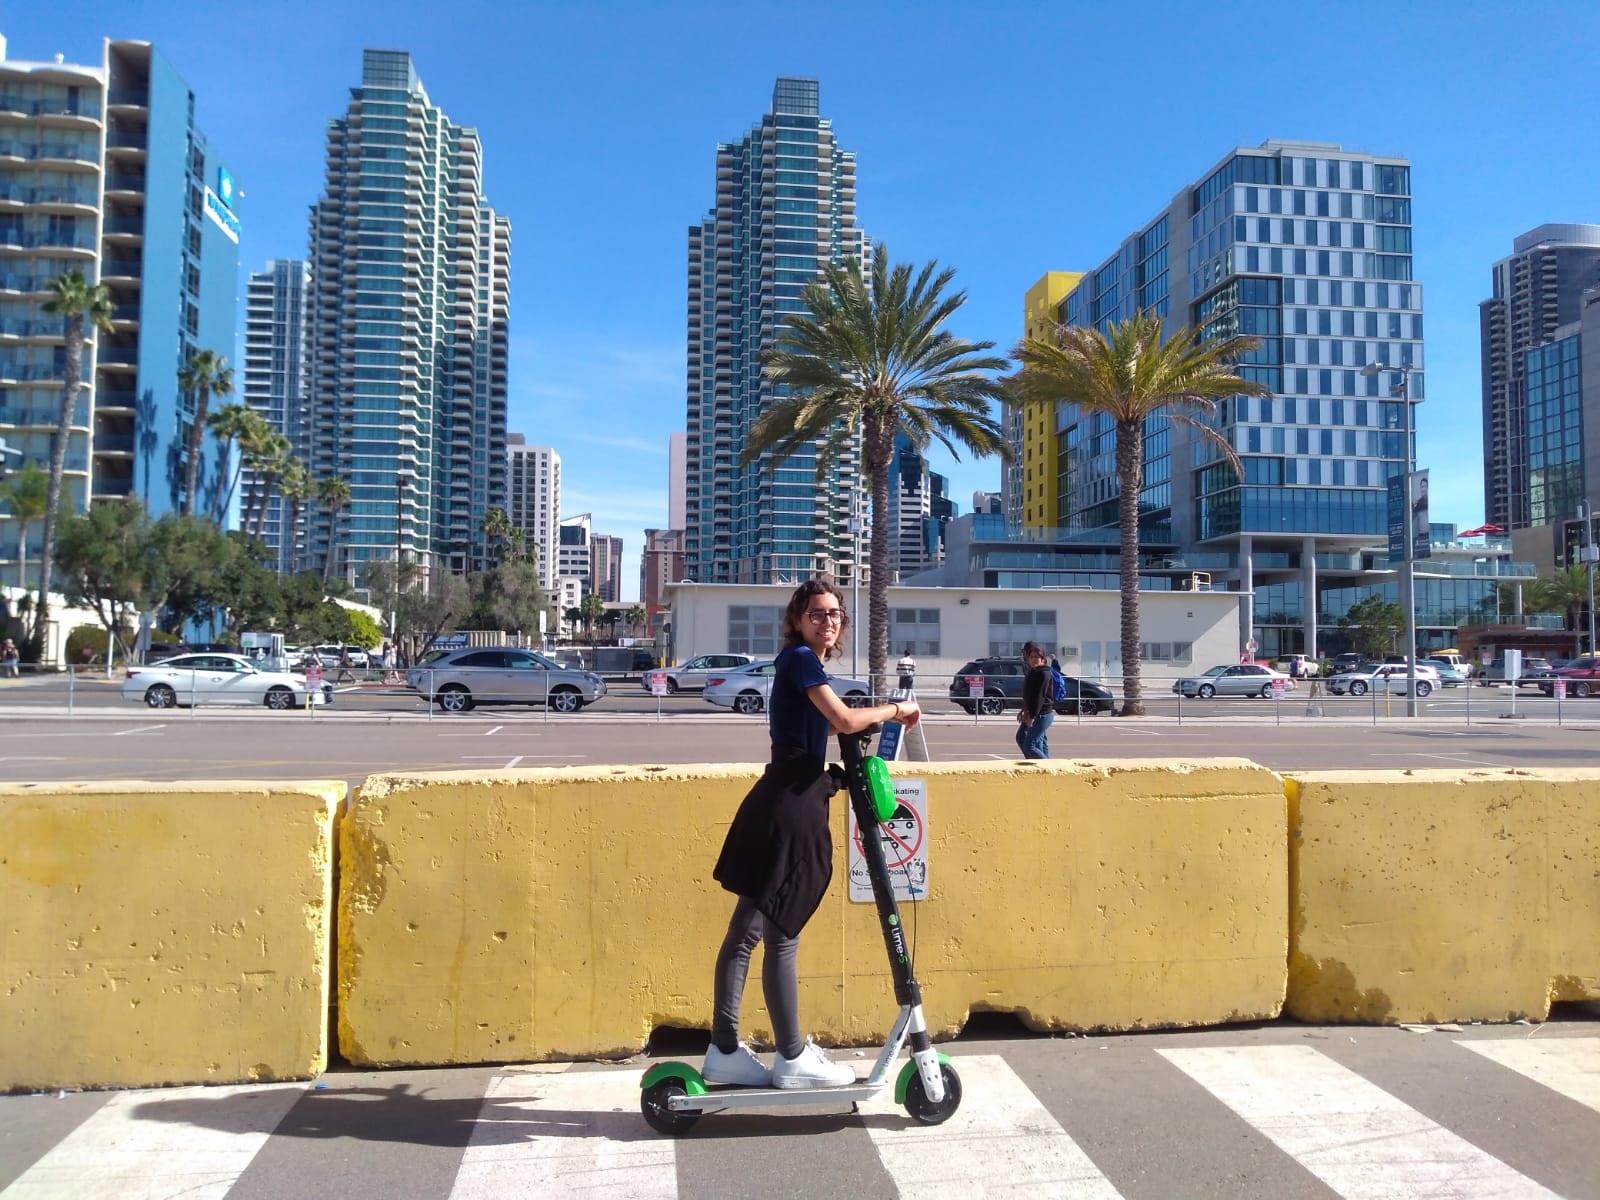 Onde ficar em San Diego - Califórnia